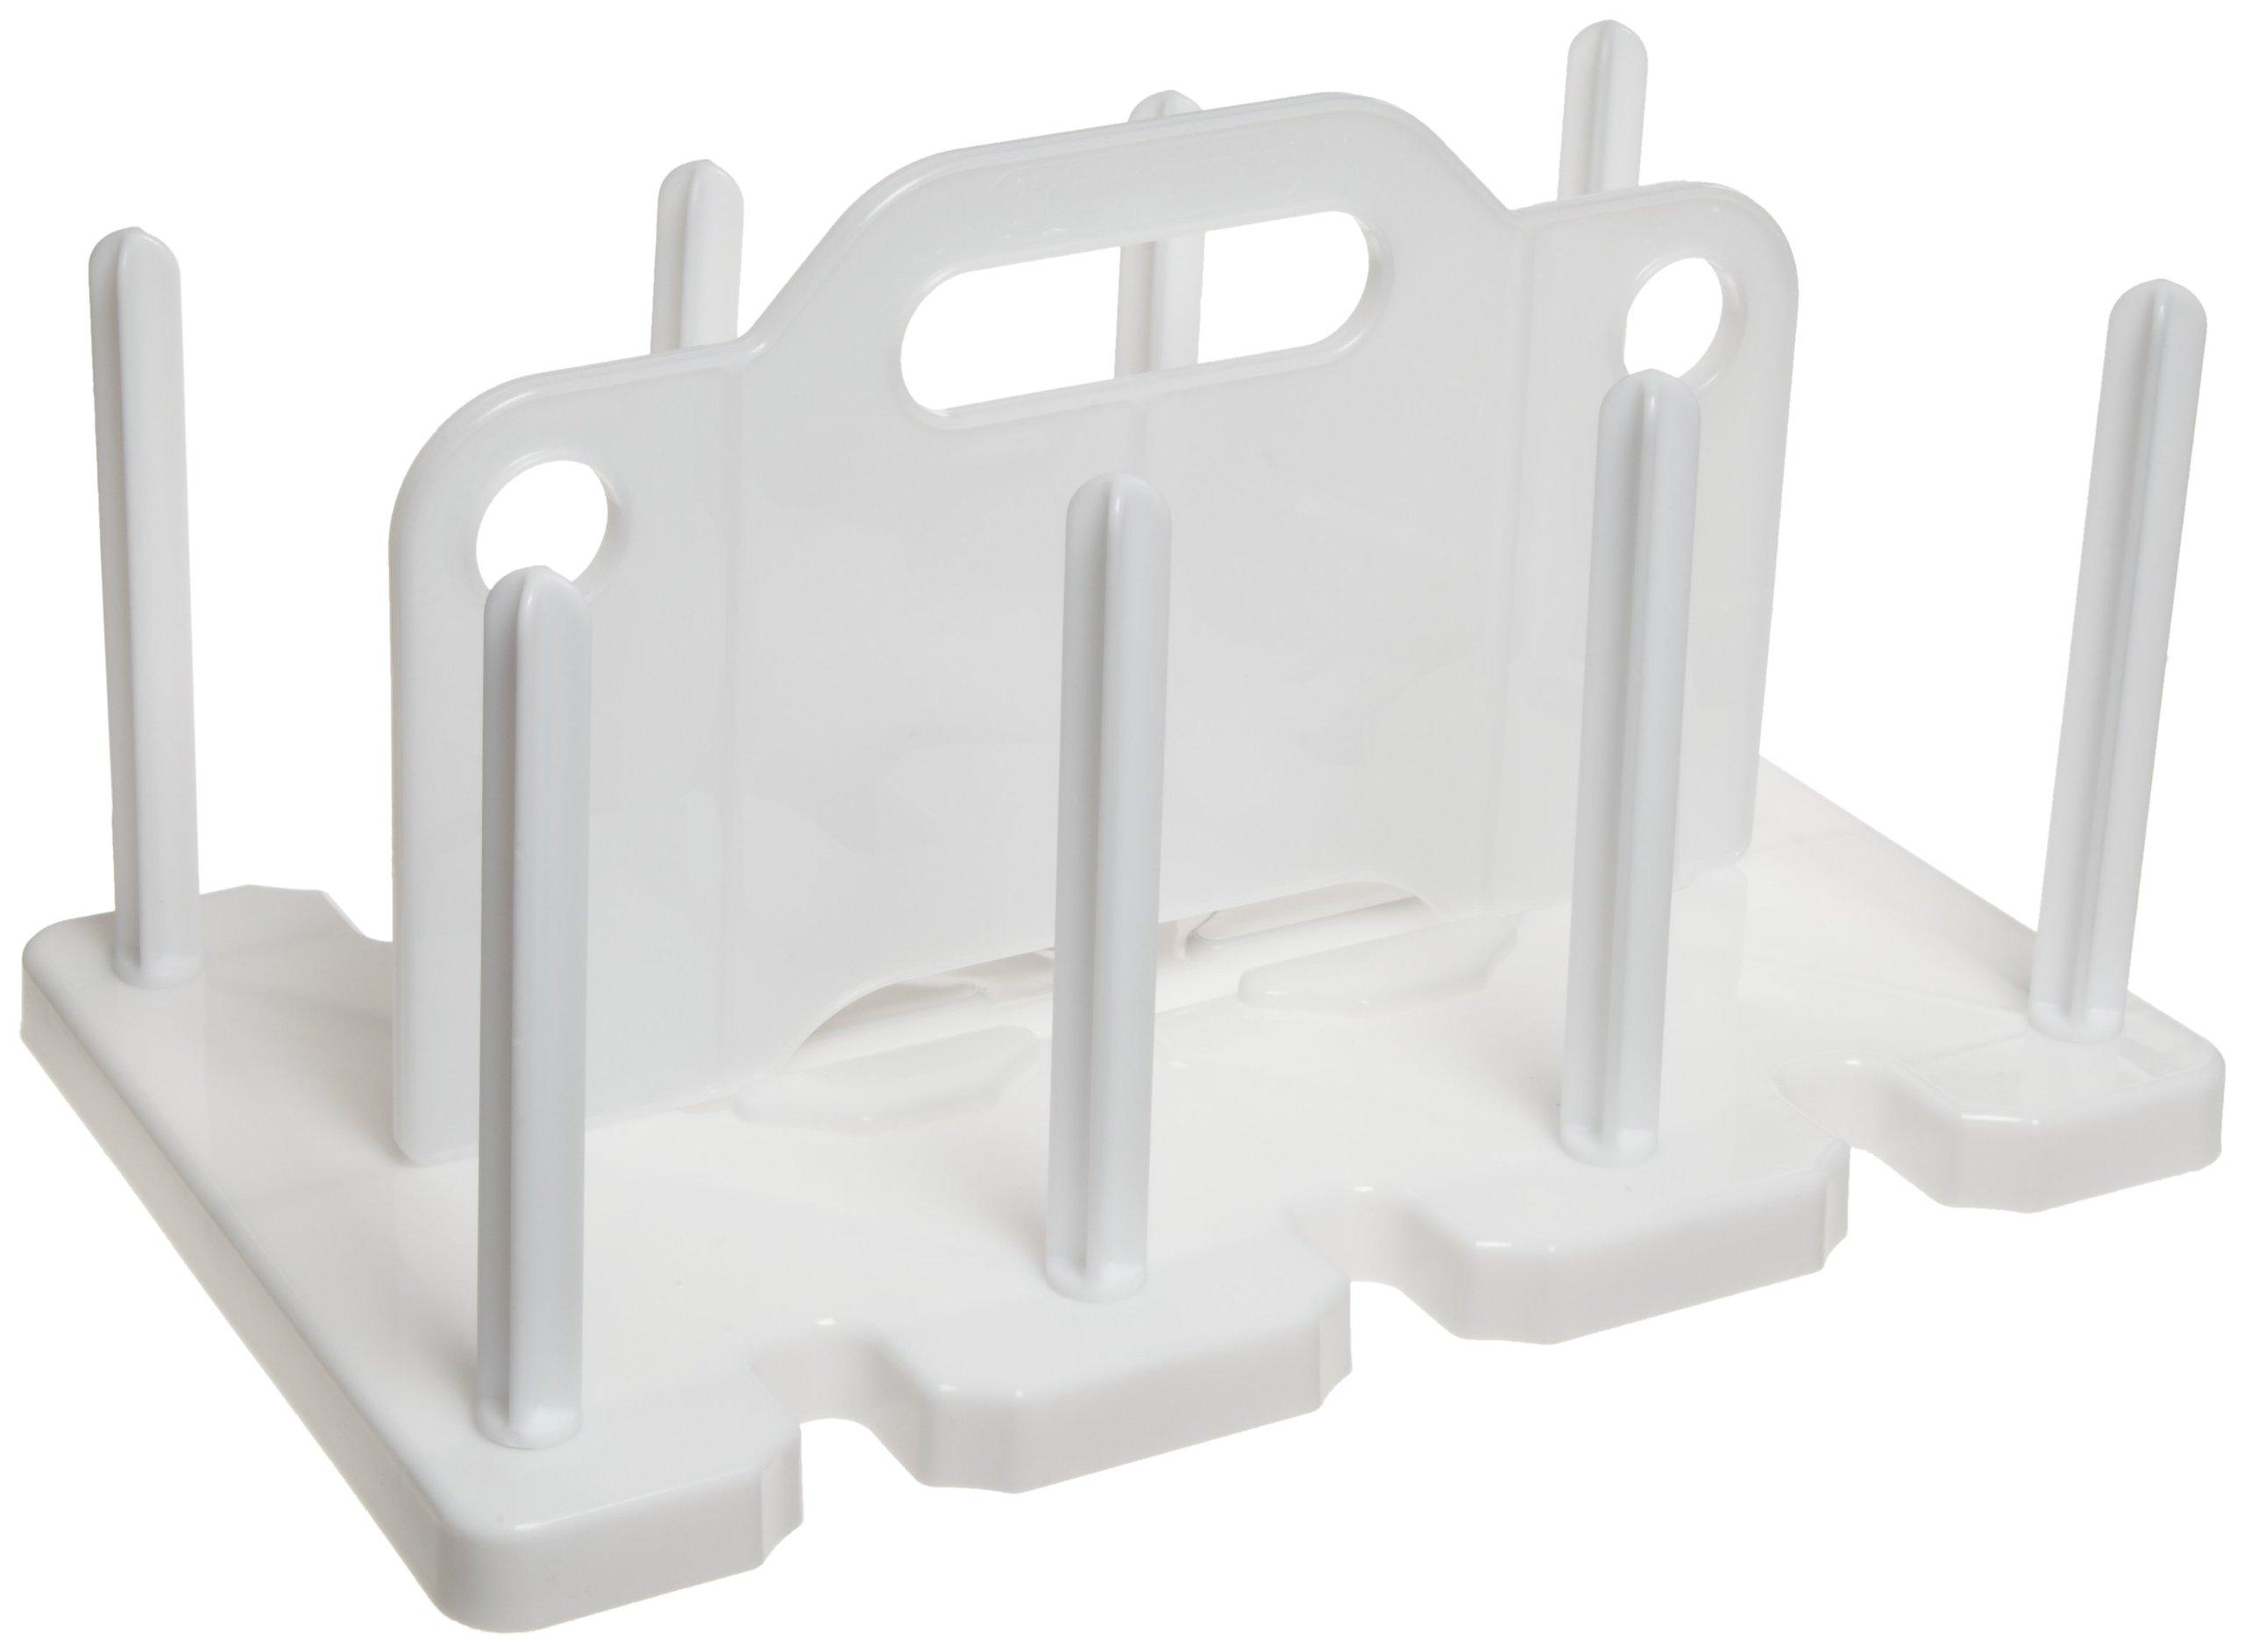 Bel-Art 100mm Petri Dish Rack; 42 Places, Plastic (F18991-0000) by SP Scienceware